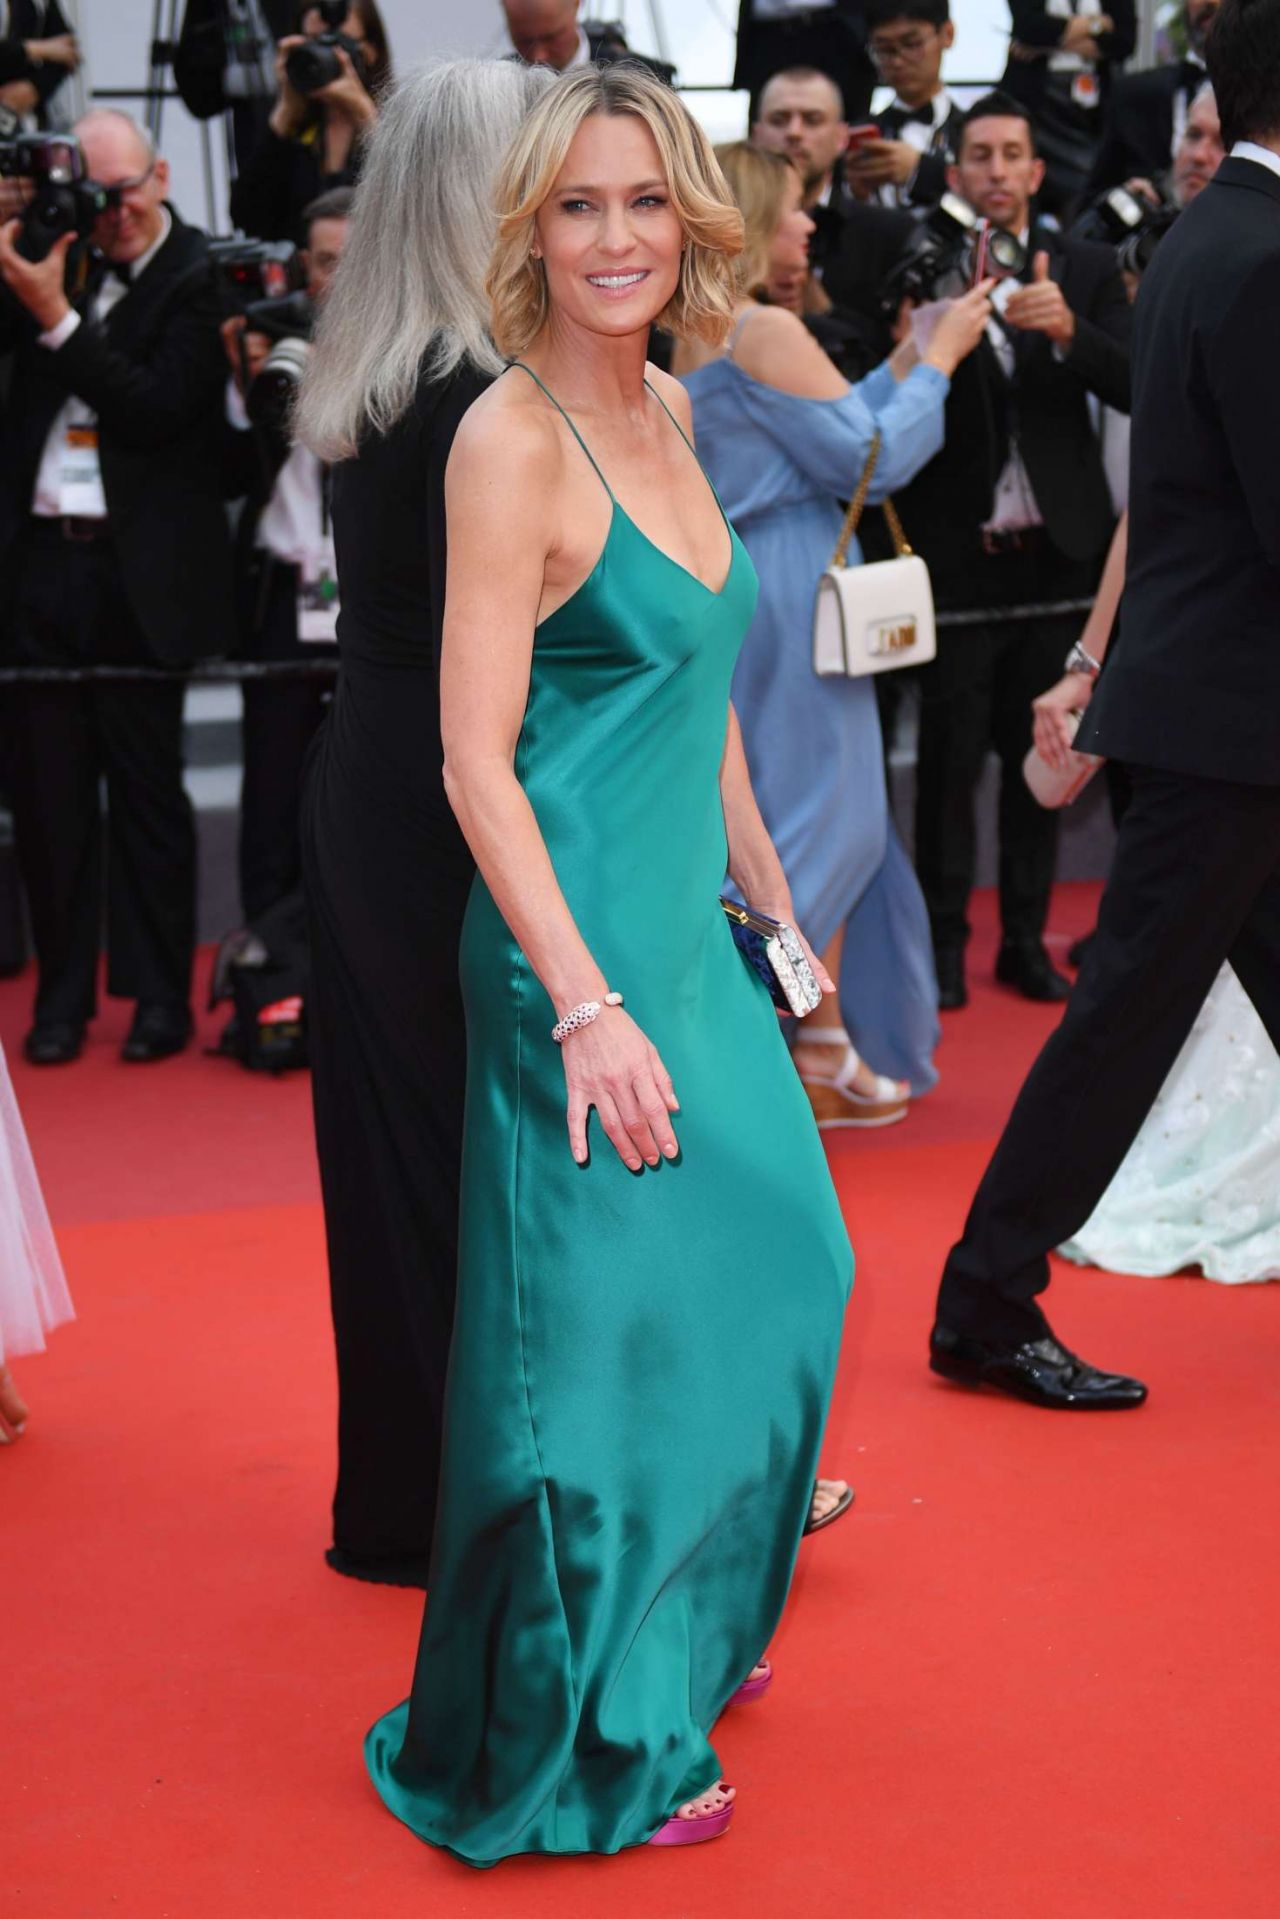 Robin Wright Loveless Nelyubov Screening At Cannes